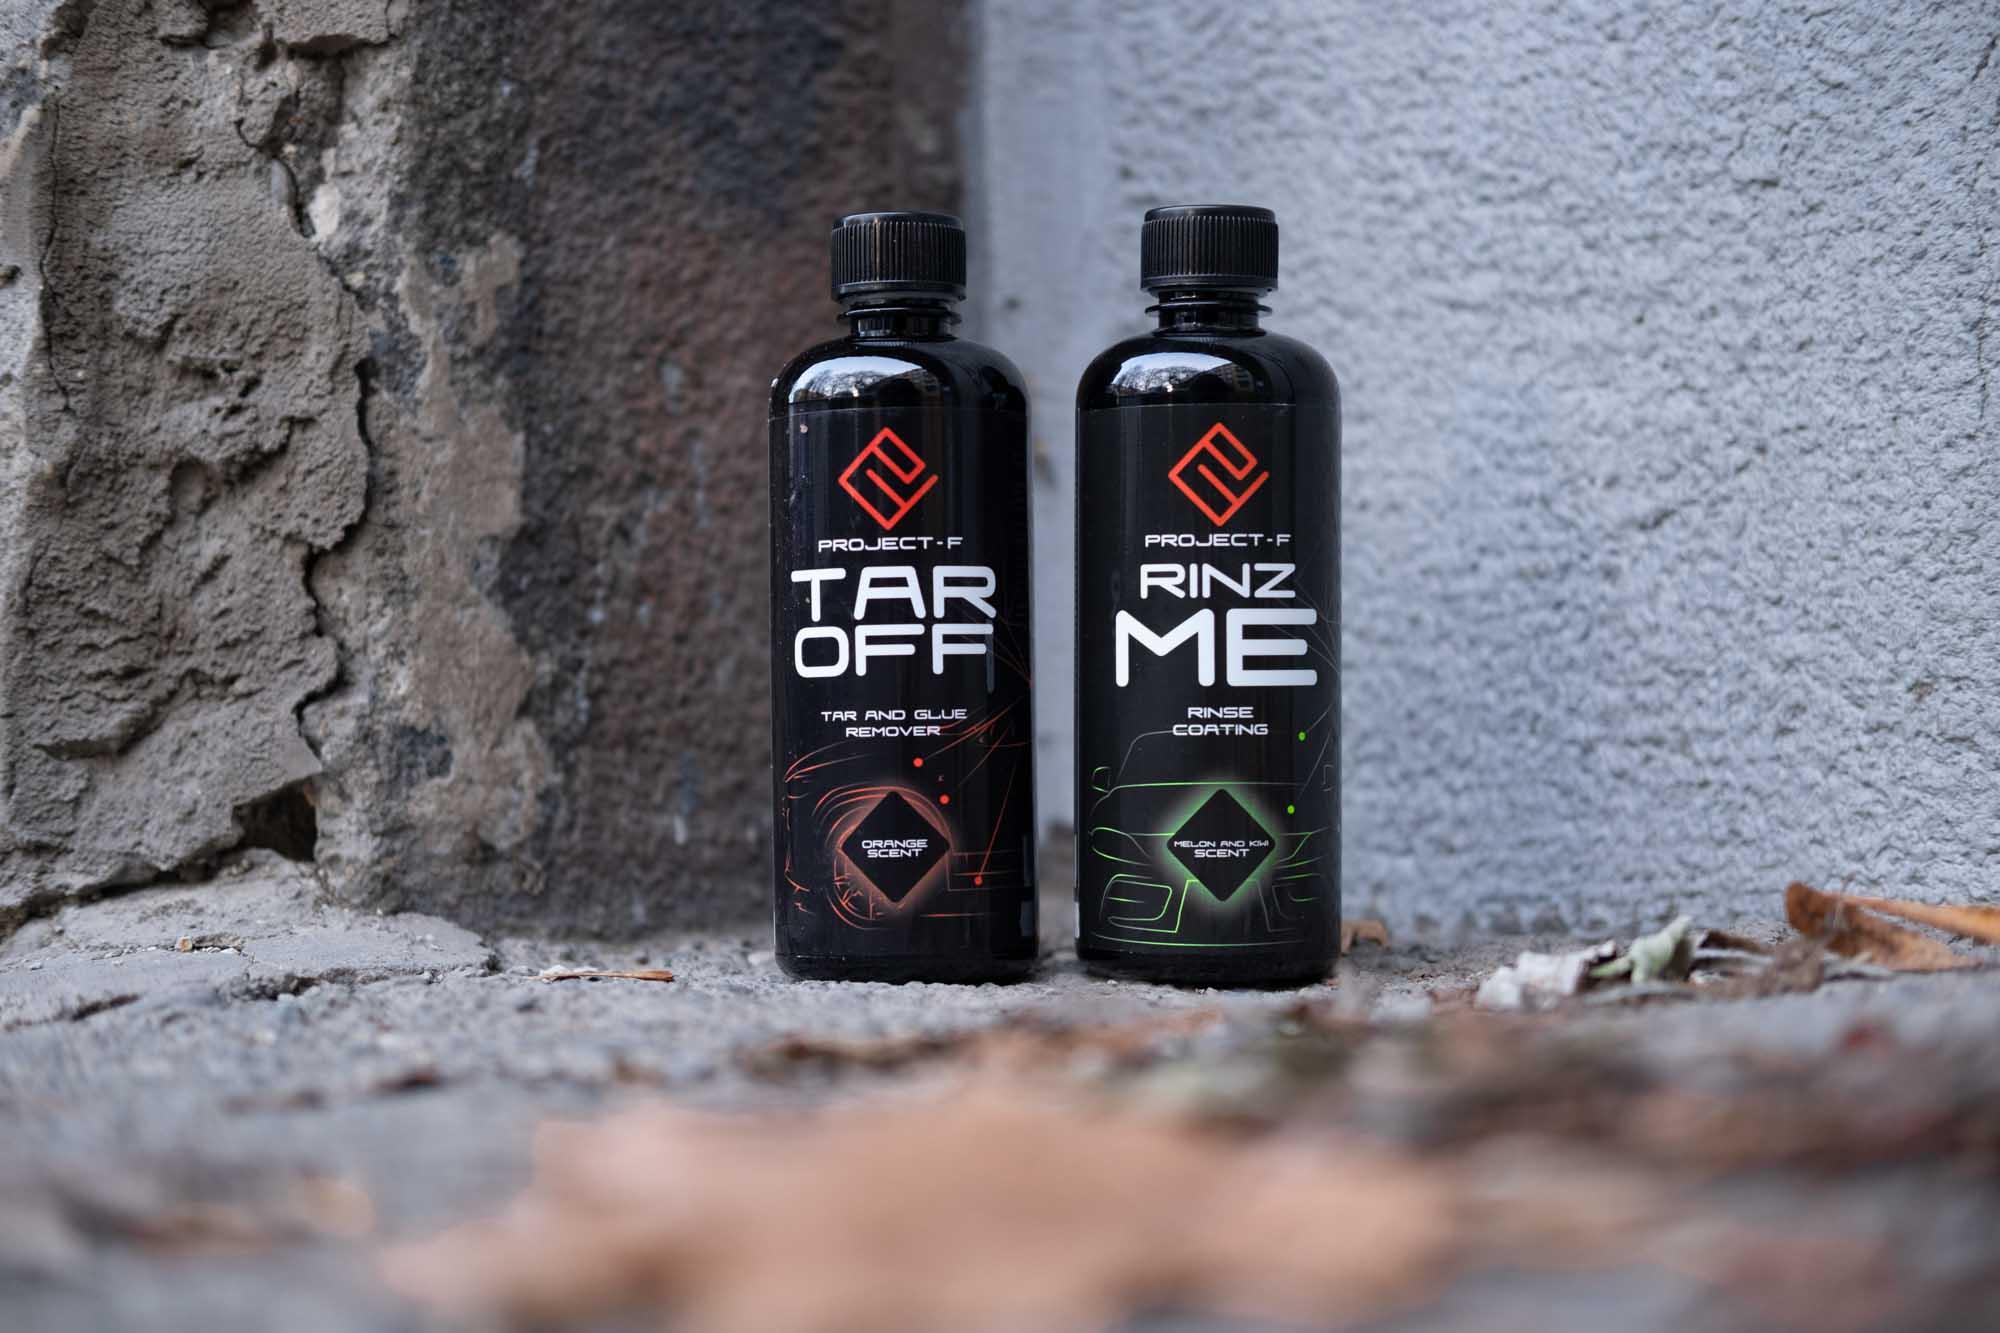 Project F - RinzME and TarOFF